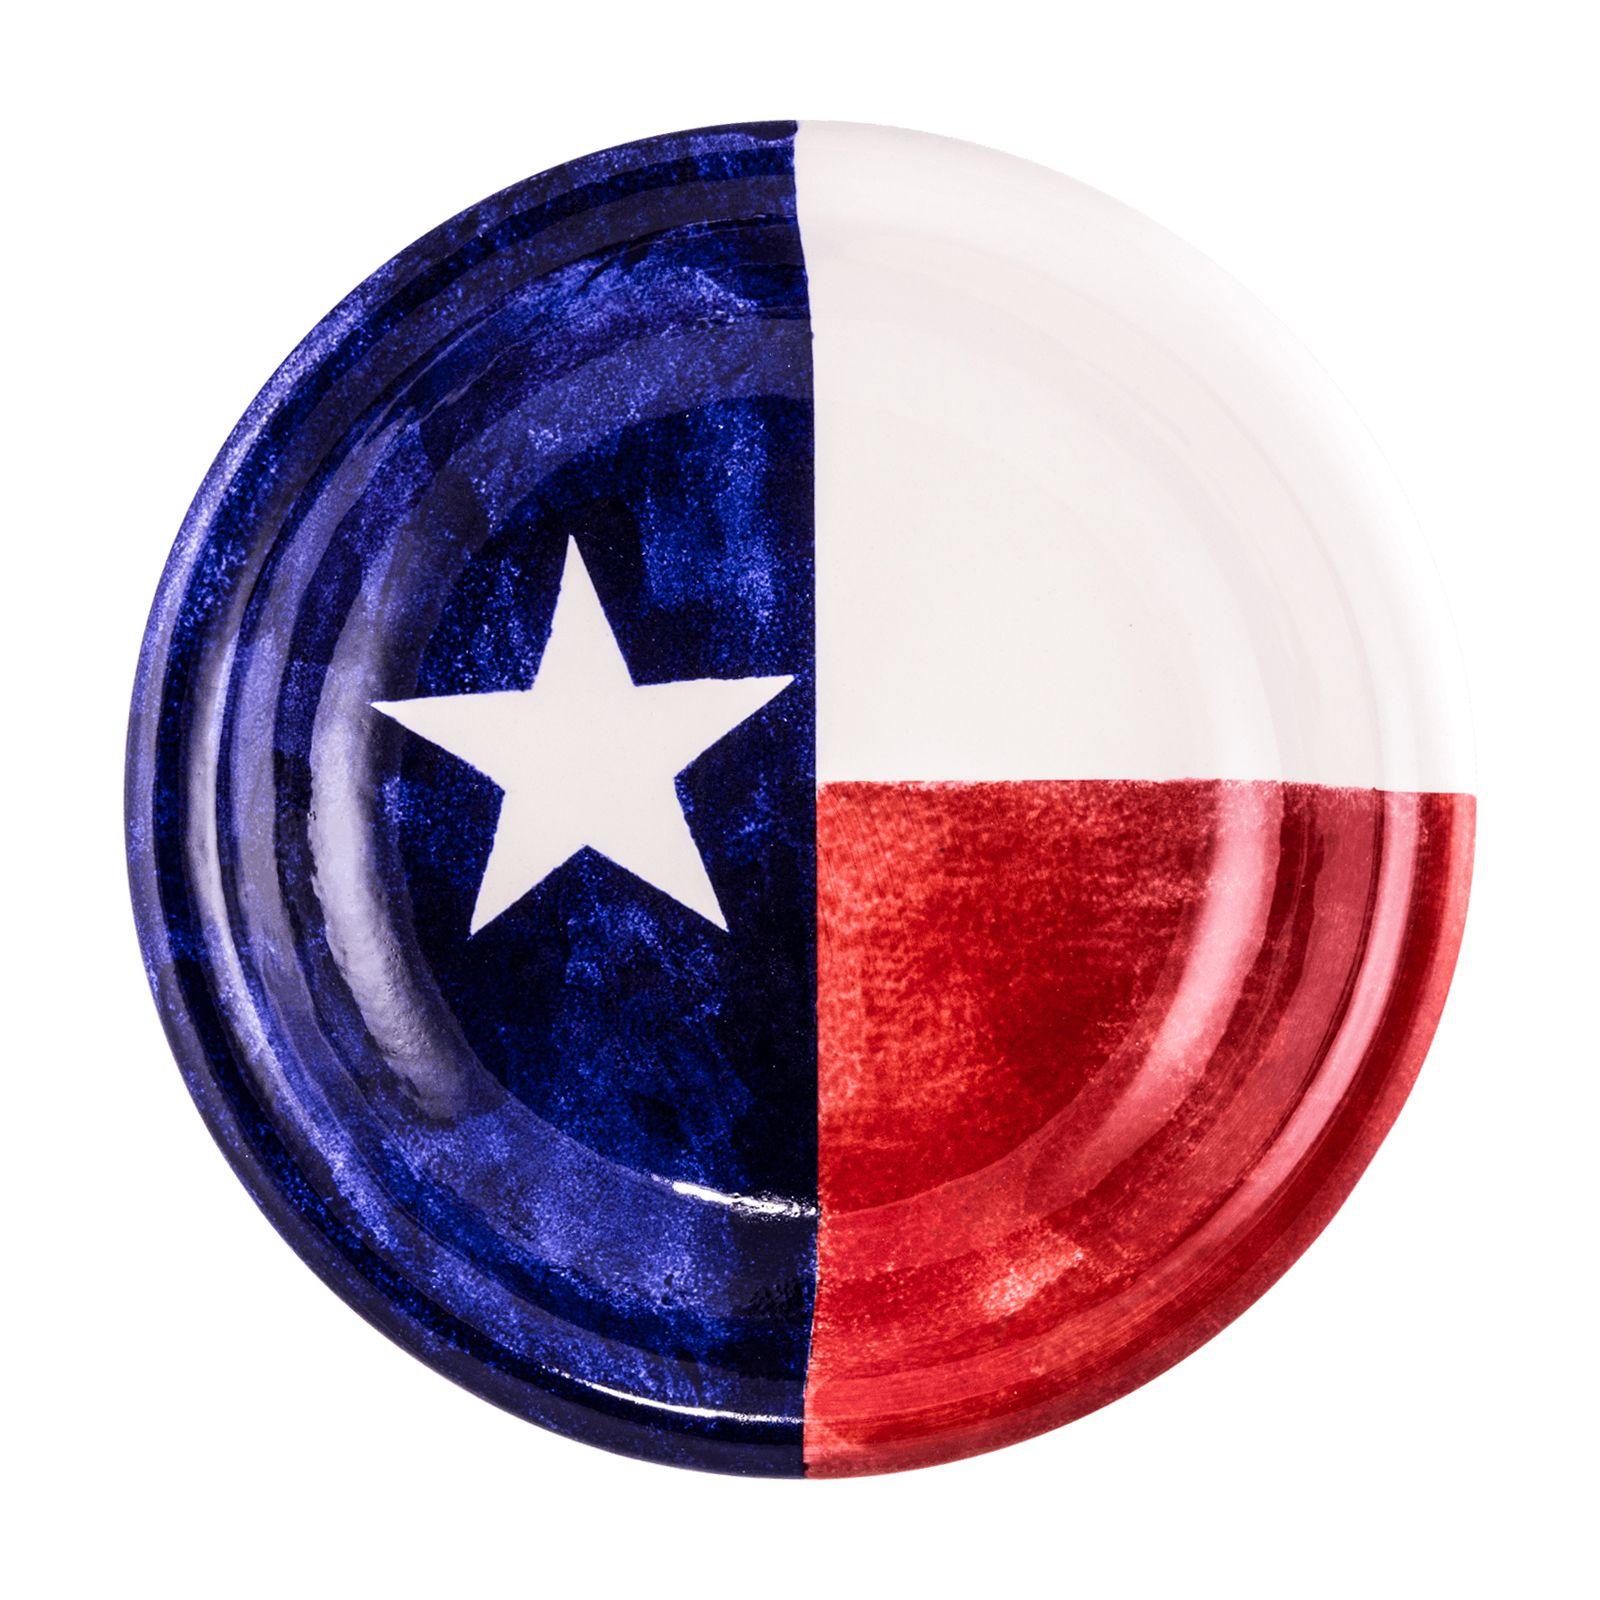 1600x1600 Texas Flag Serving Bowl Texas Capitol Gift Shop